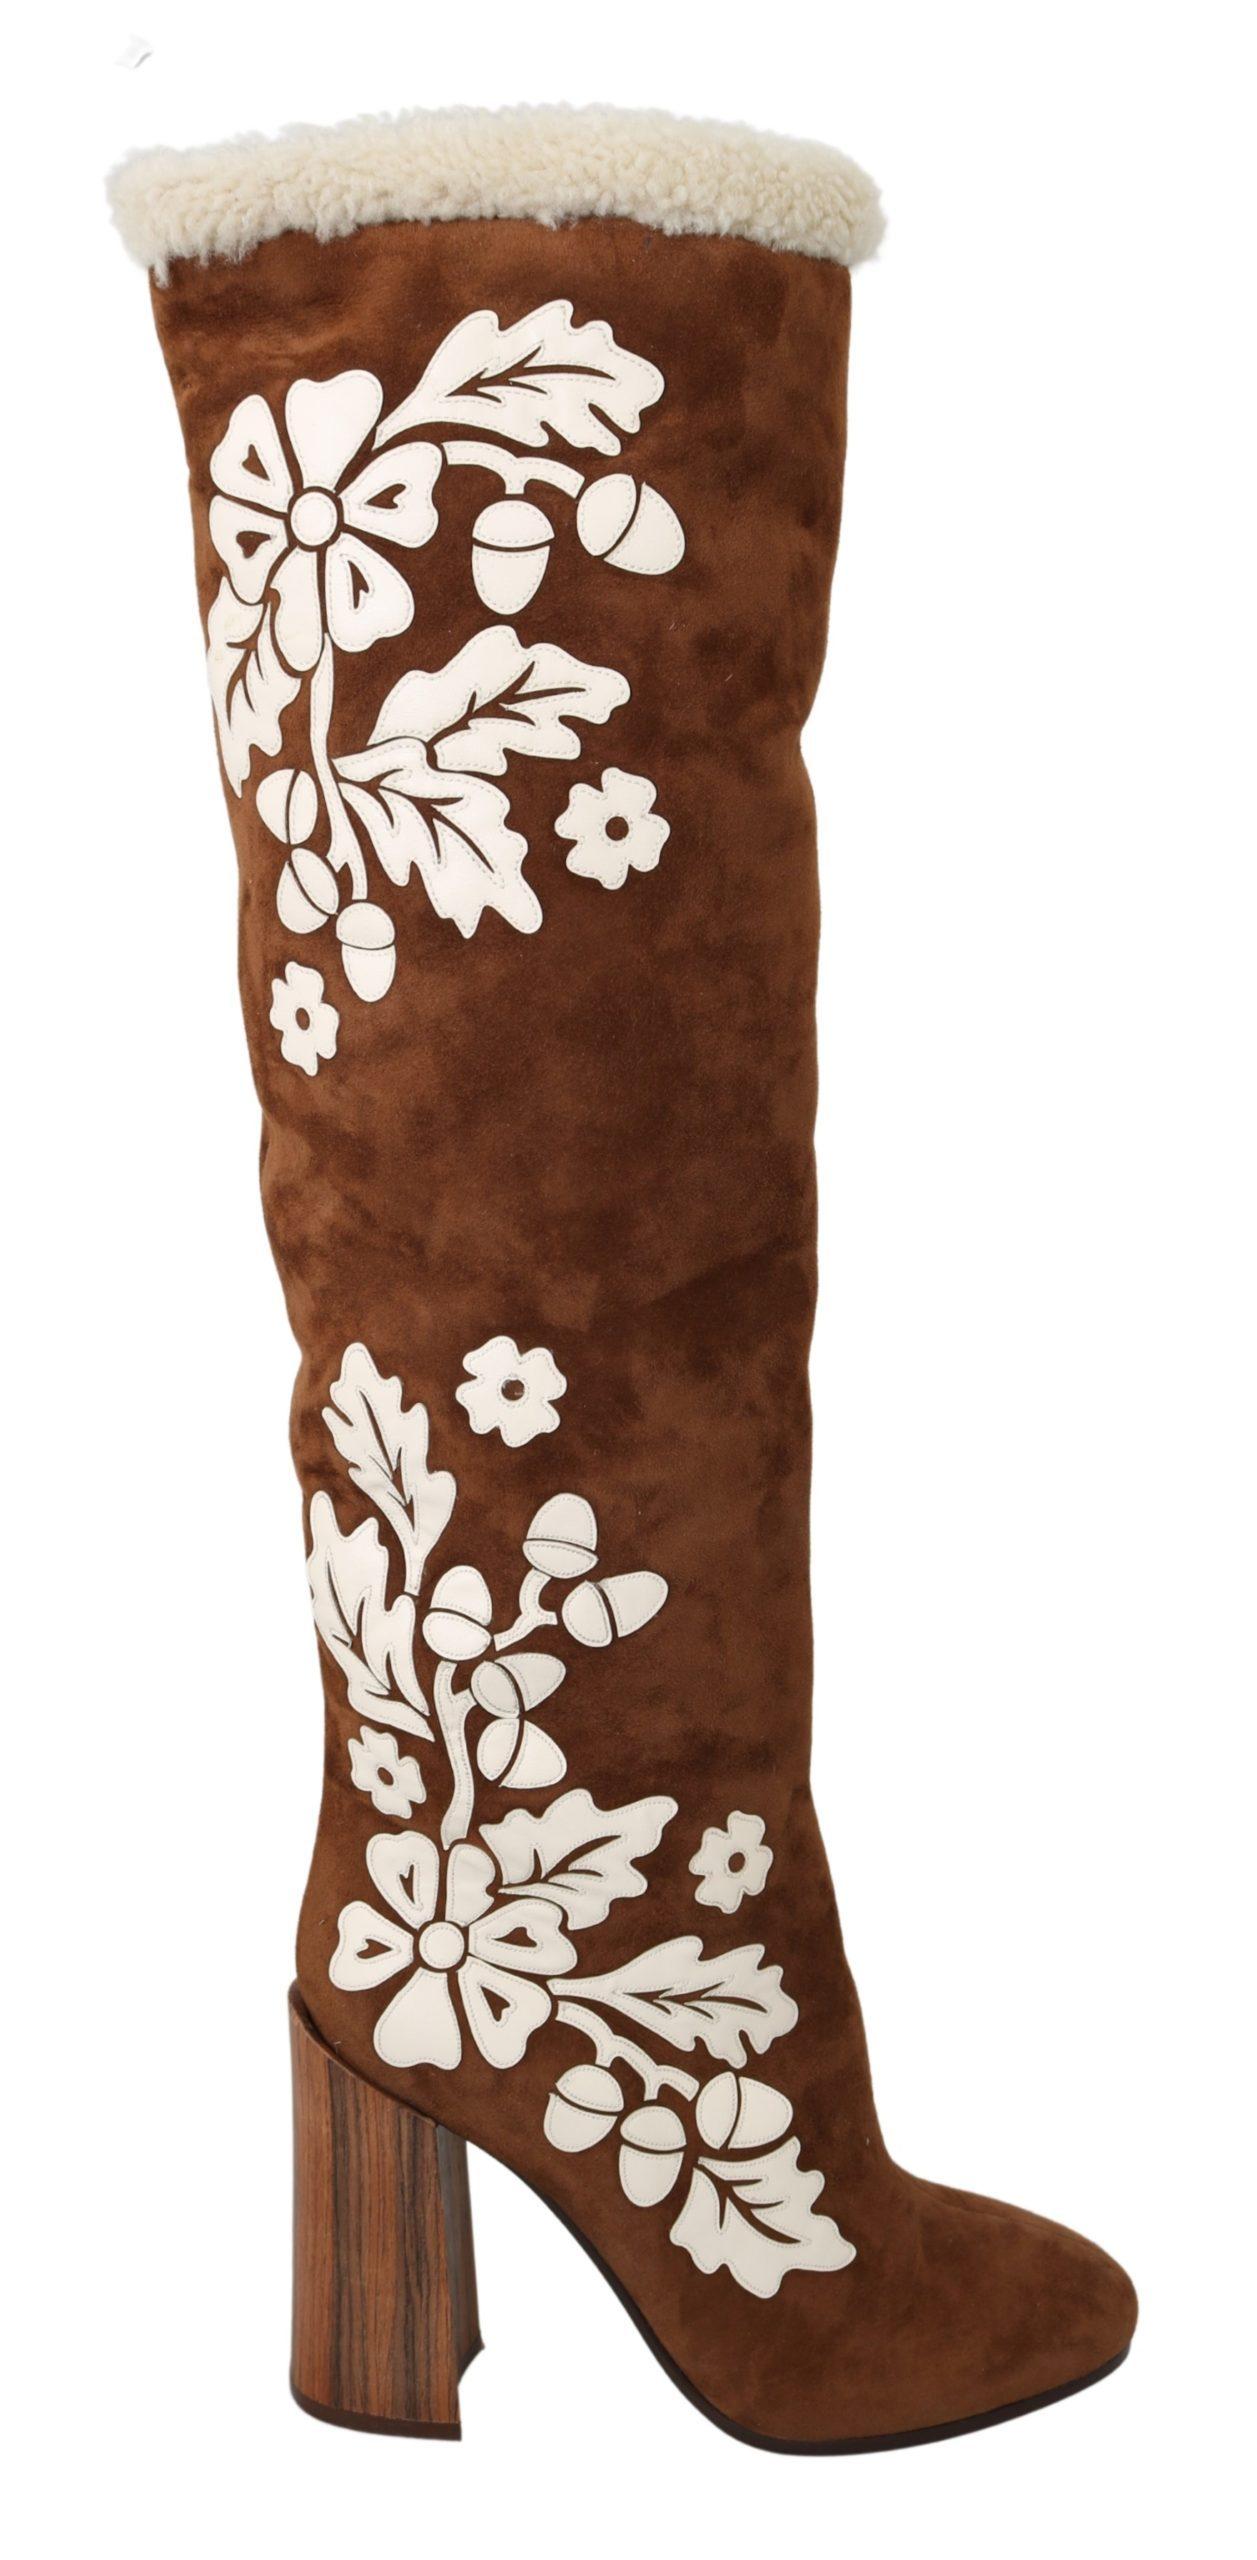 Dolce & Gabbana Women's Suede Floral Knee High Boot Brown LA7090 - EU39/US8.5